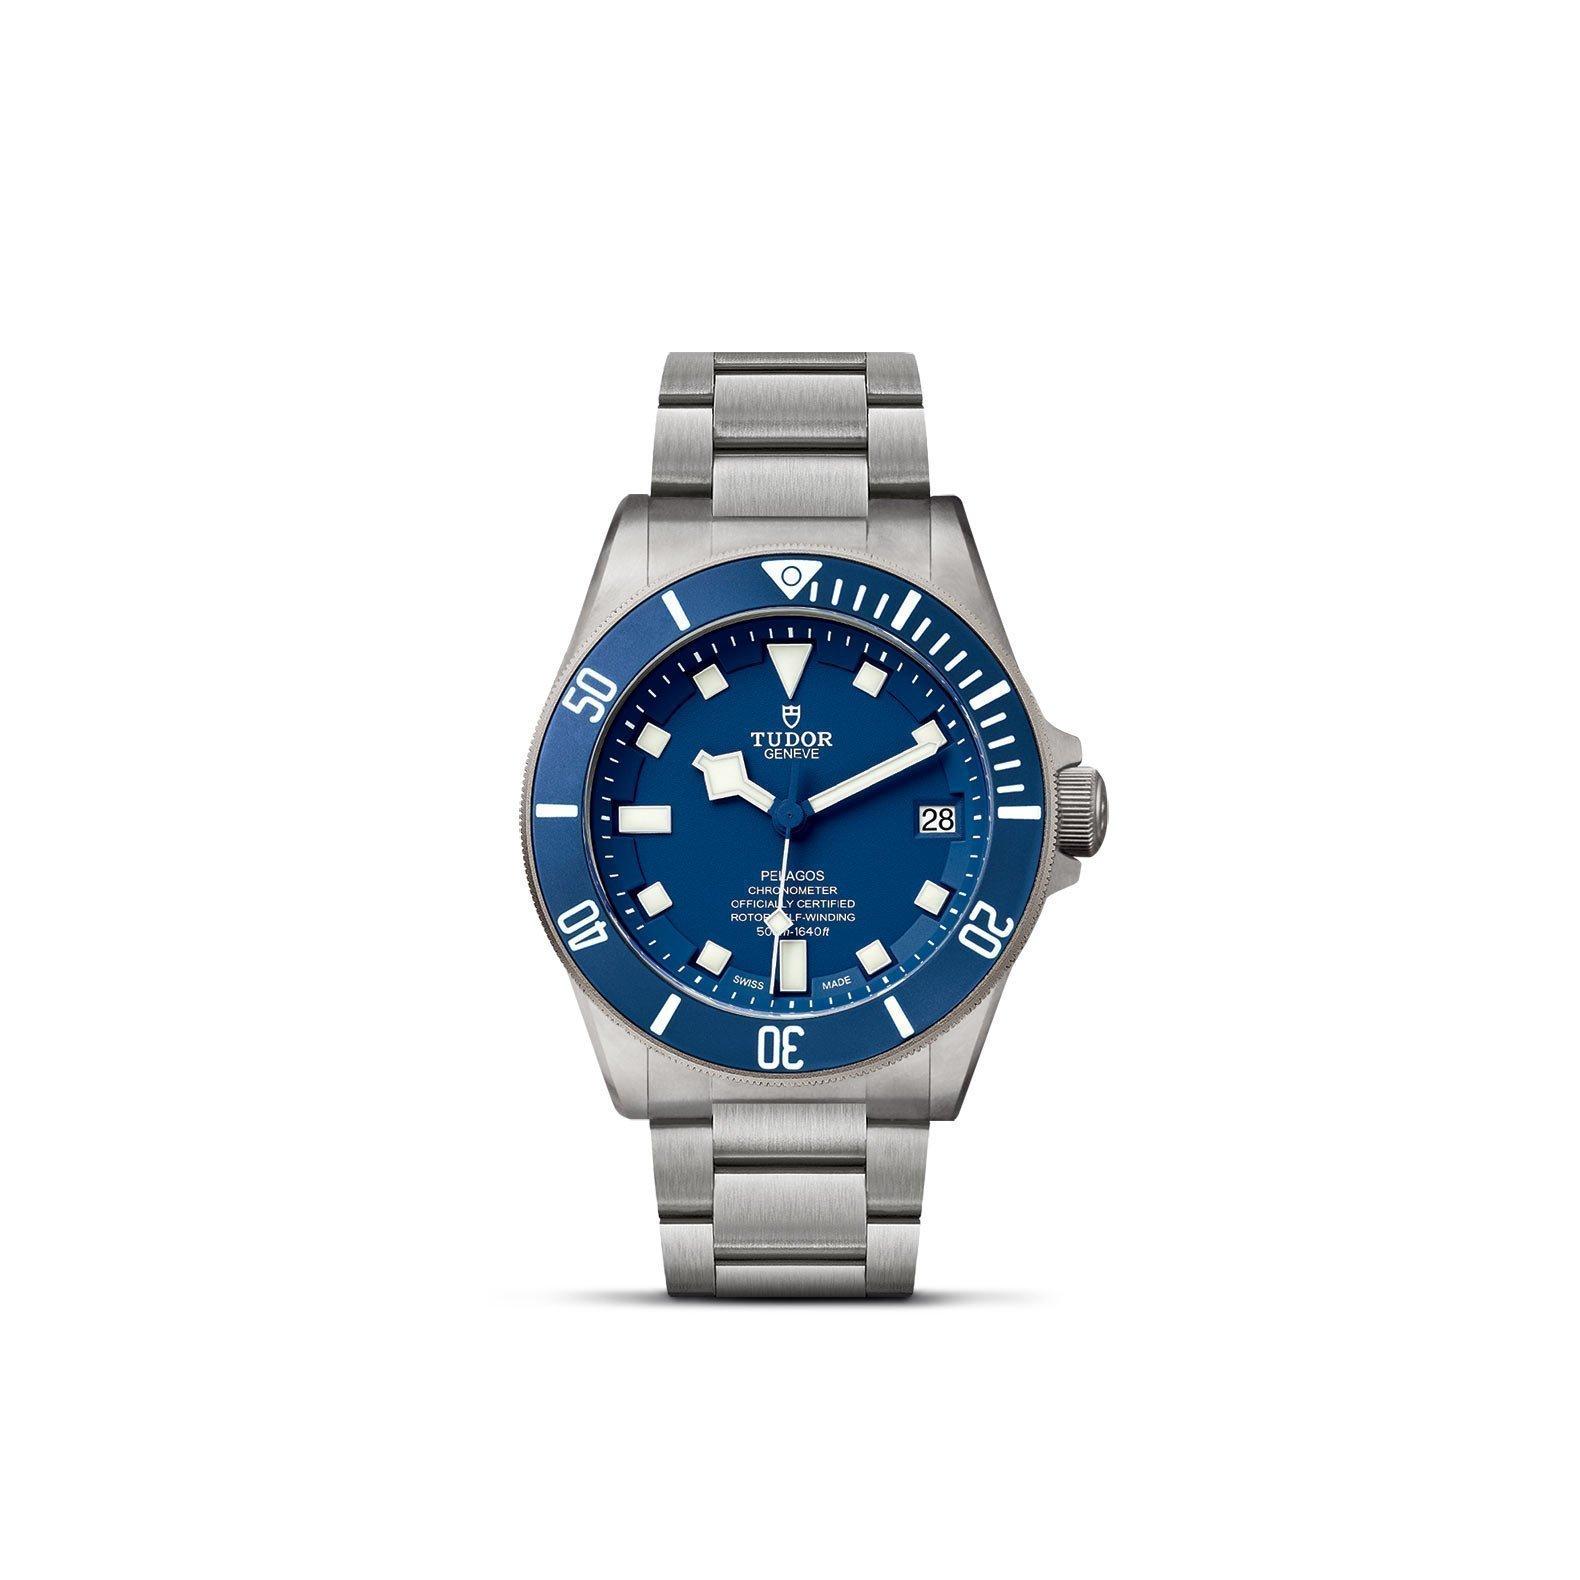 Montre TUDOR Pelagos disque bleu mat en céramique, bracelet en titane vue 1